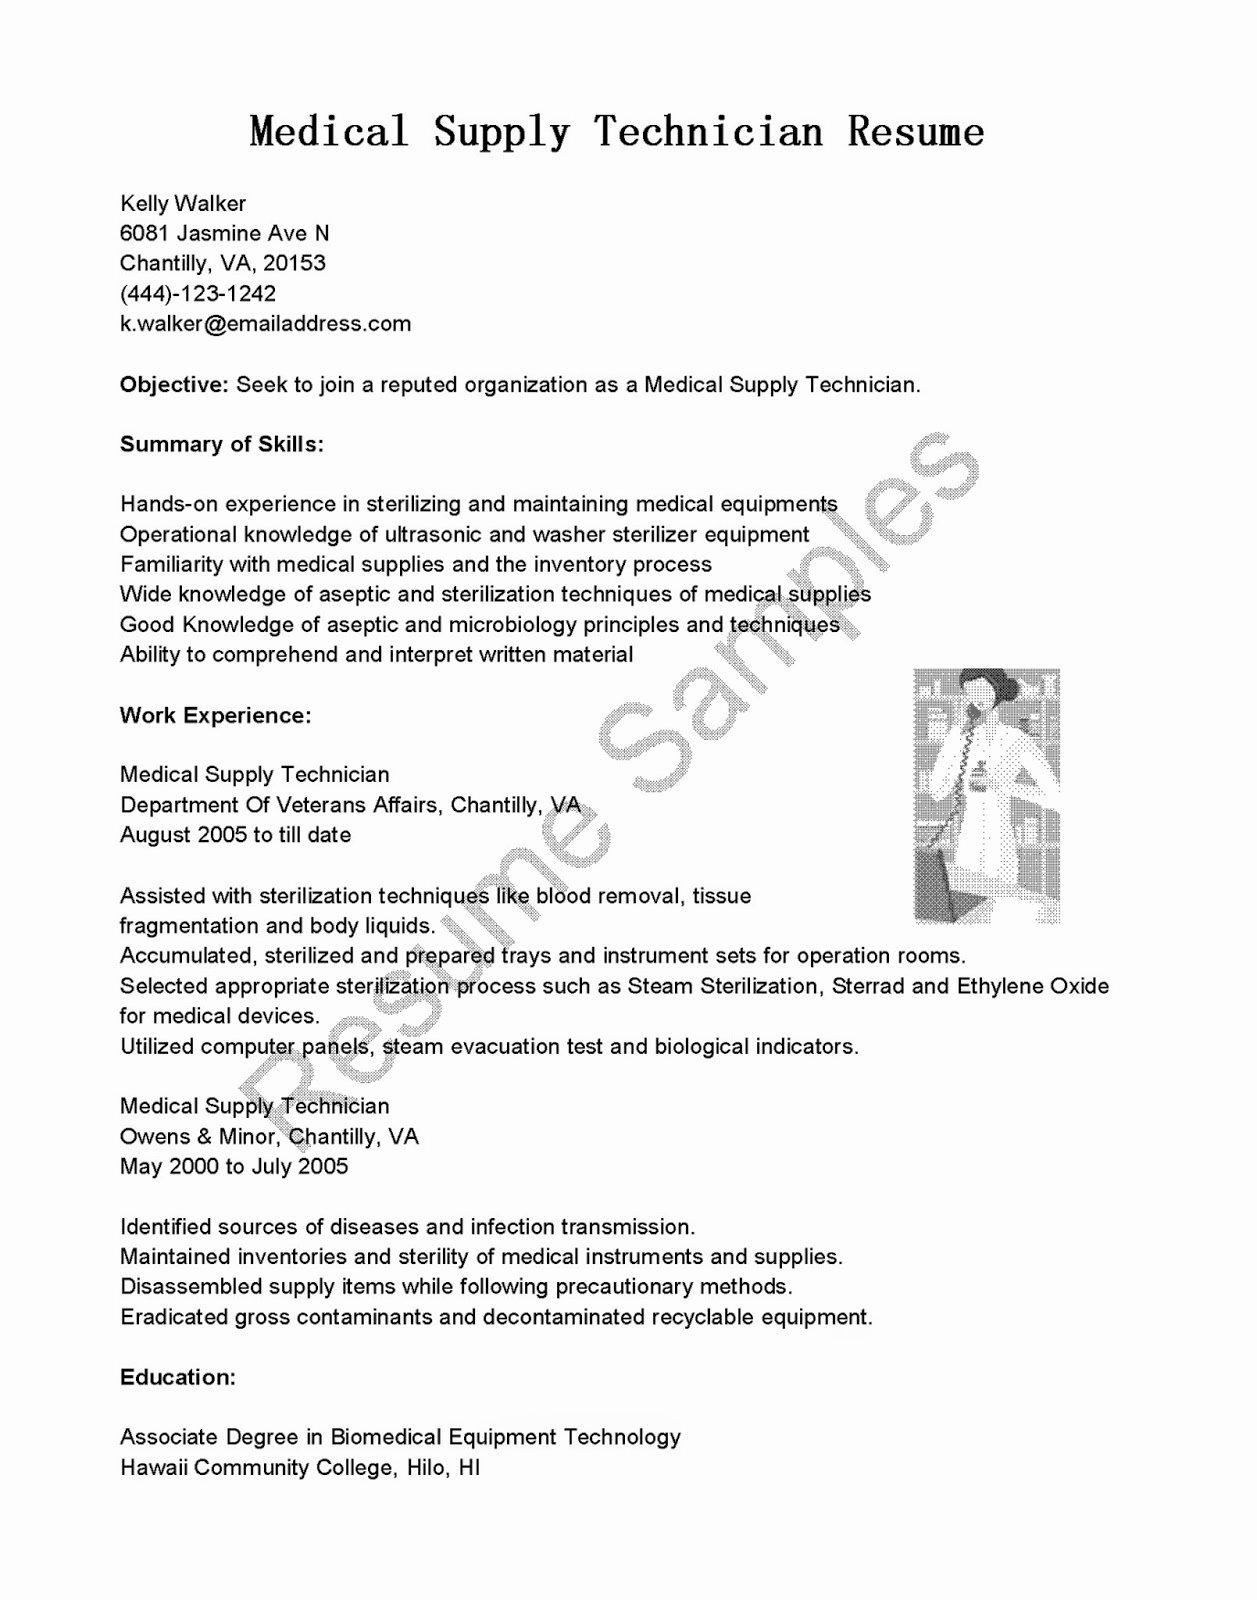 Resume Samples Medical Supply Technician Resume Sample